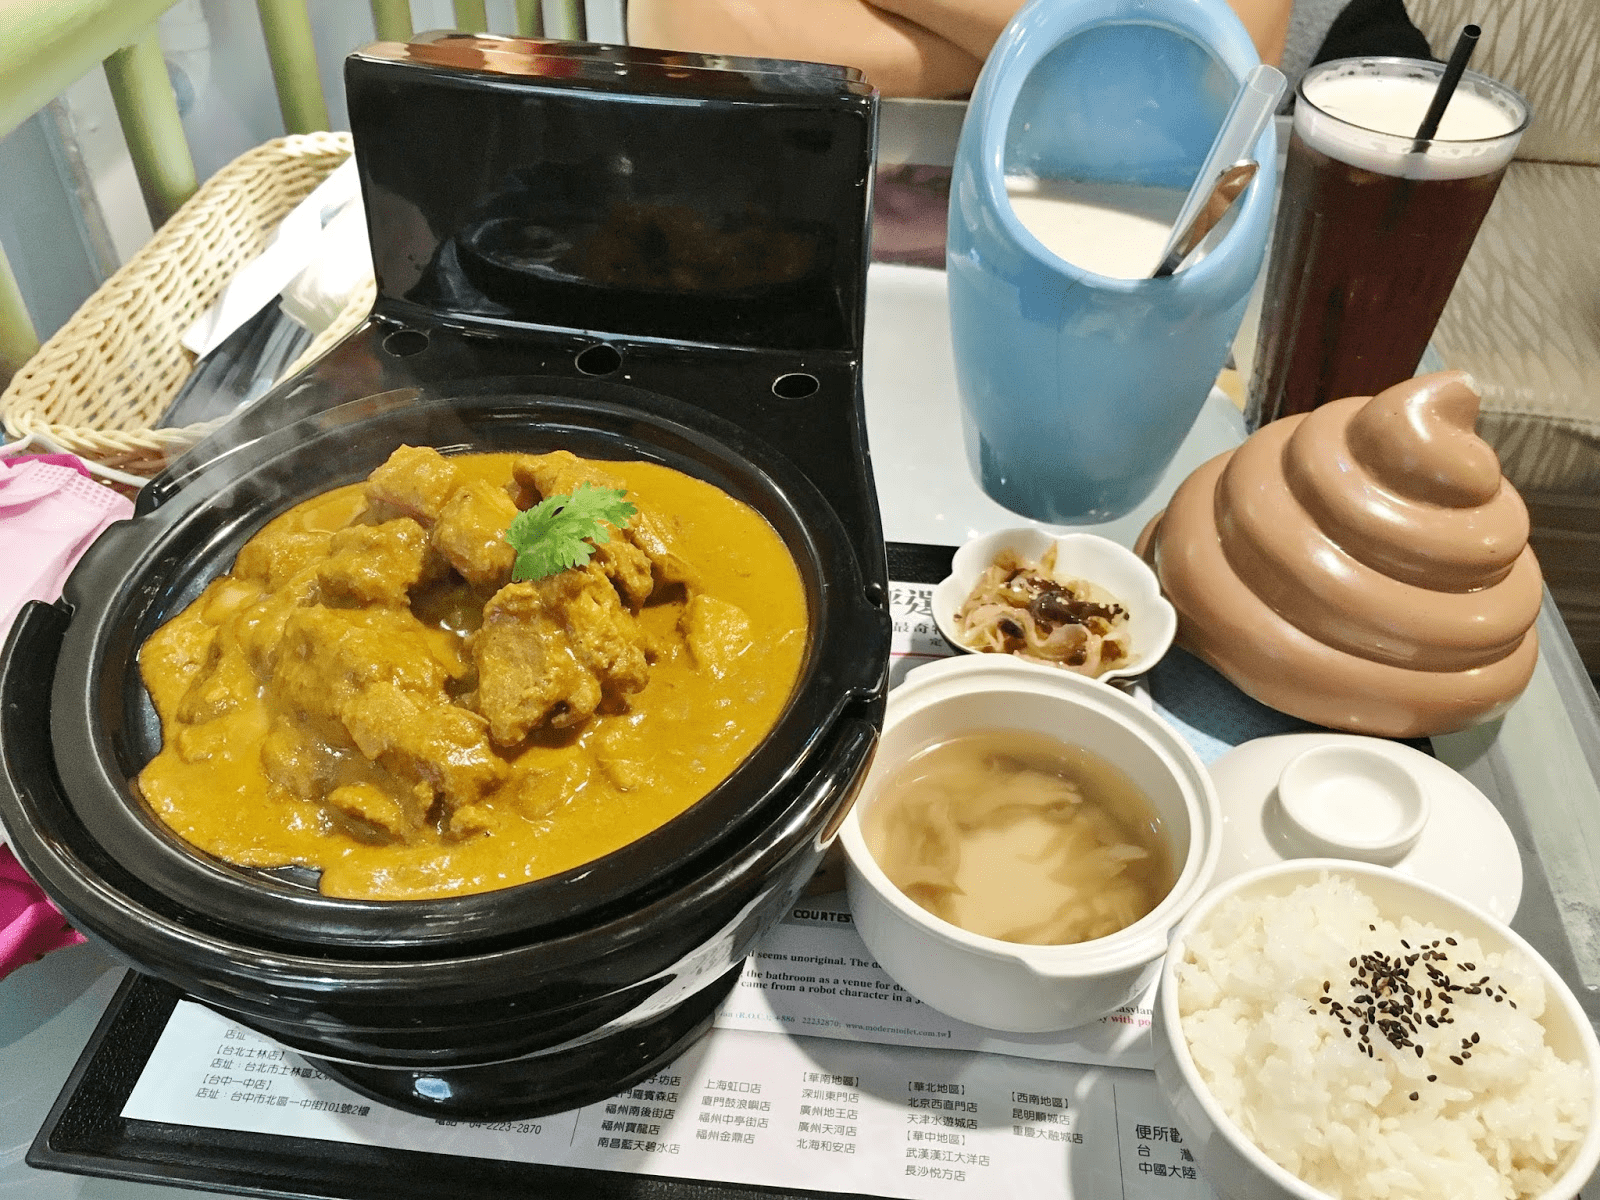 Modern-Toilet-Restaurant-Curry-Rice